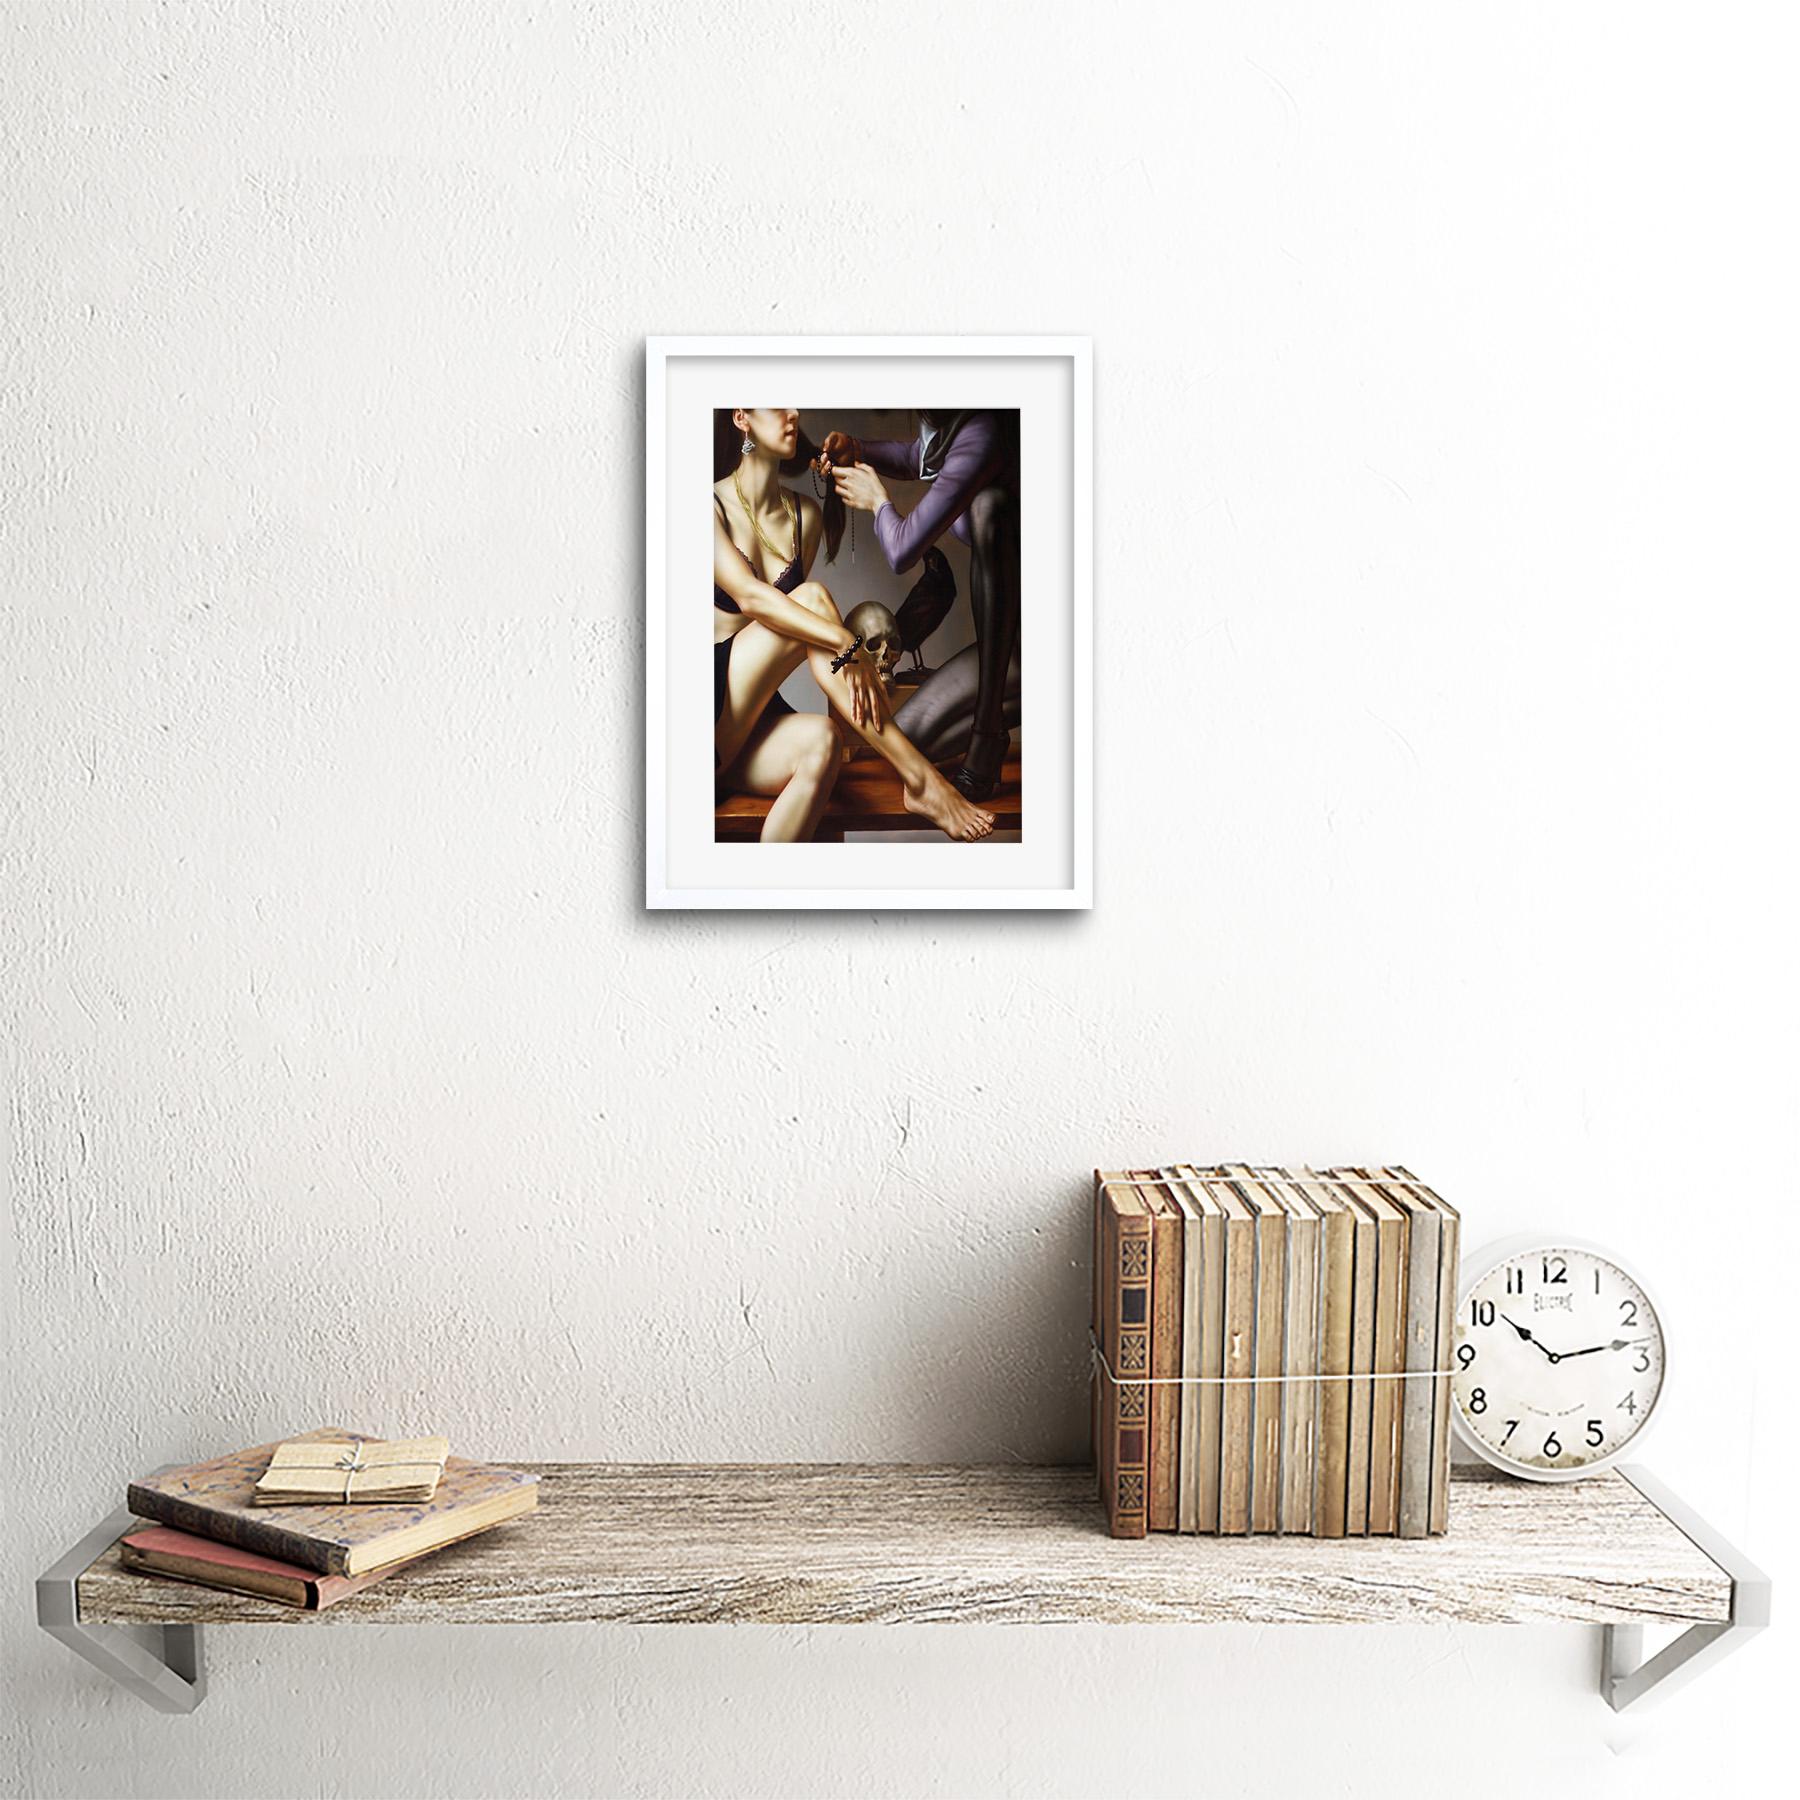 Painting-Balcar-Entering-Renaissance-Framed-Art-Print-9x7-Inch 縮圖 18